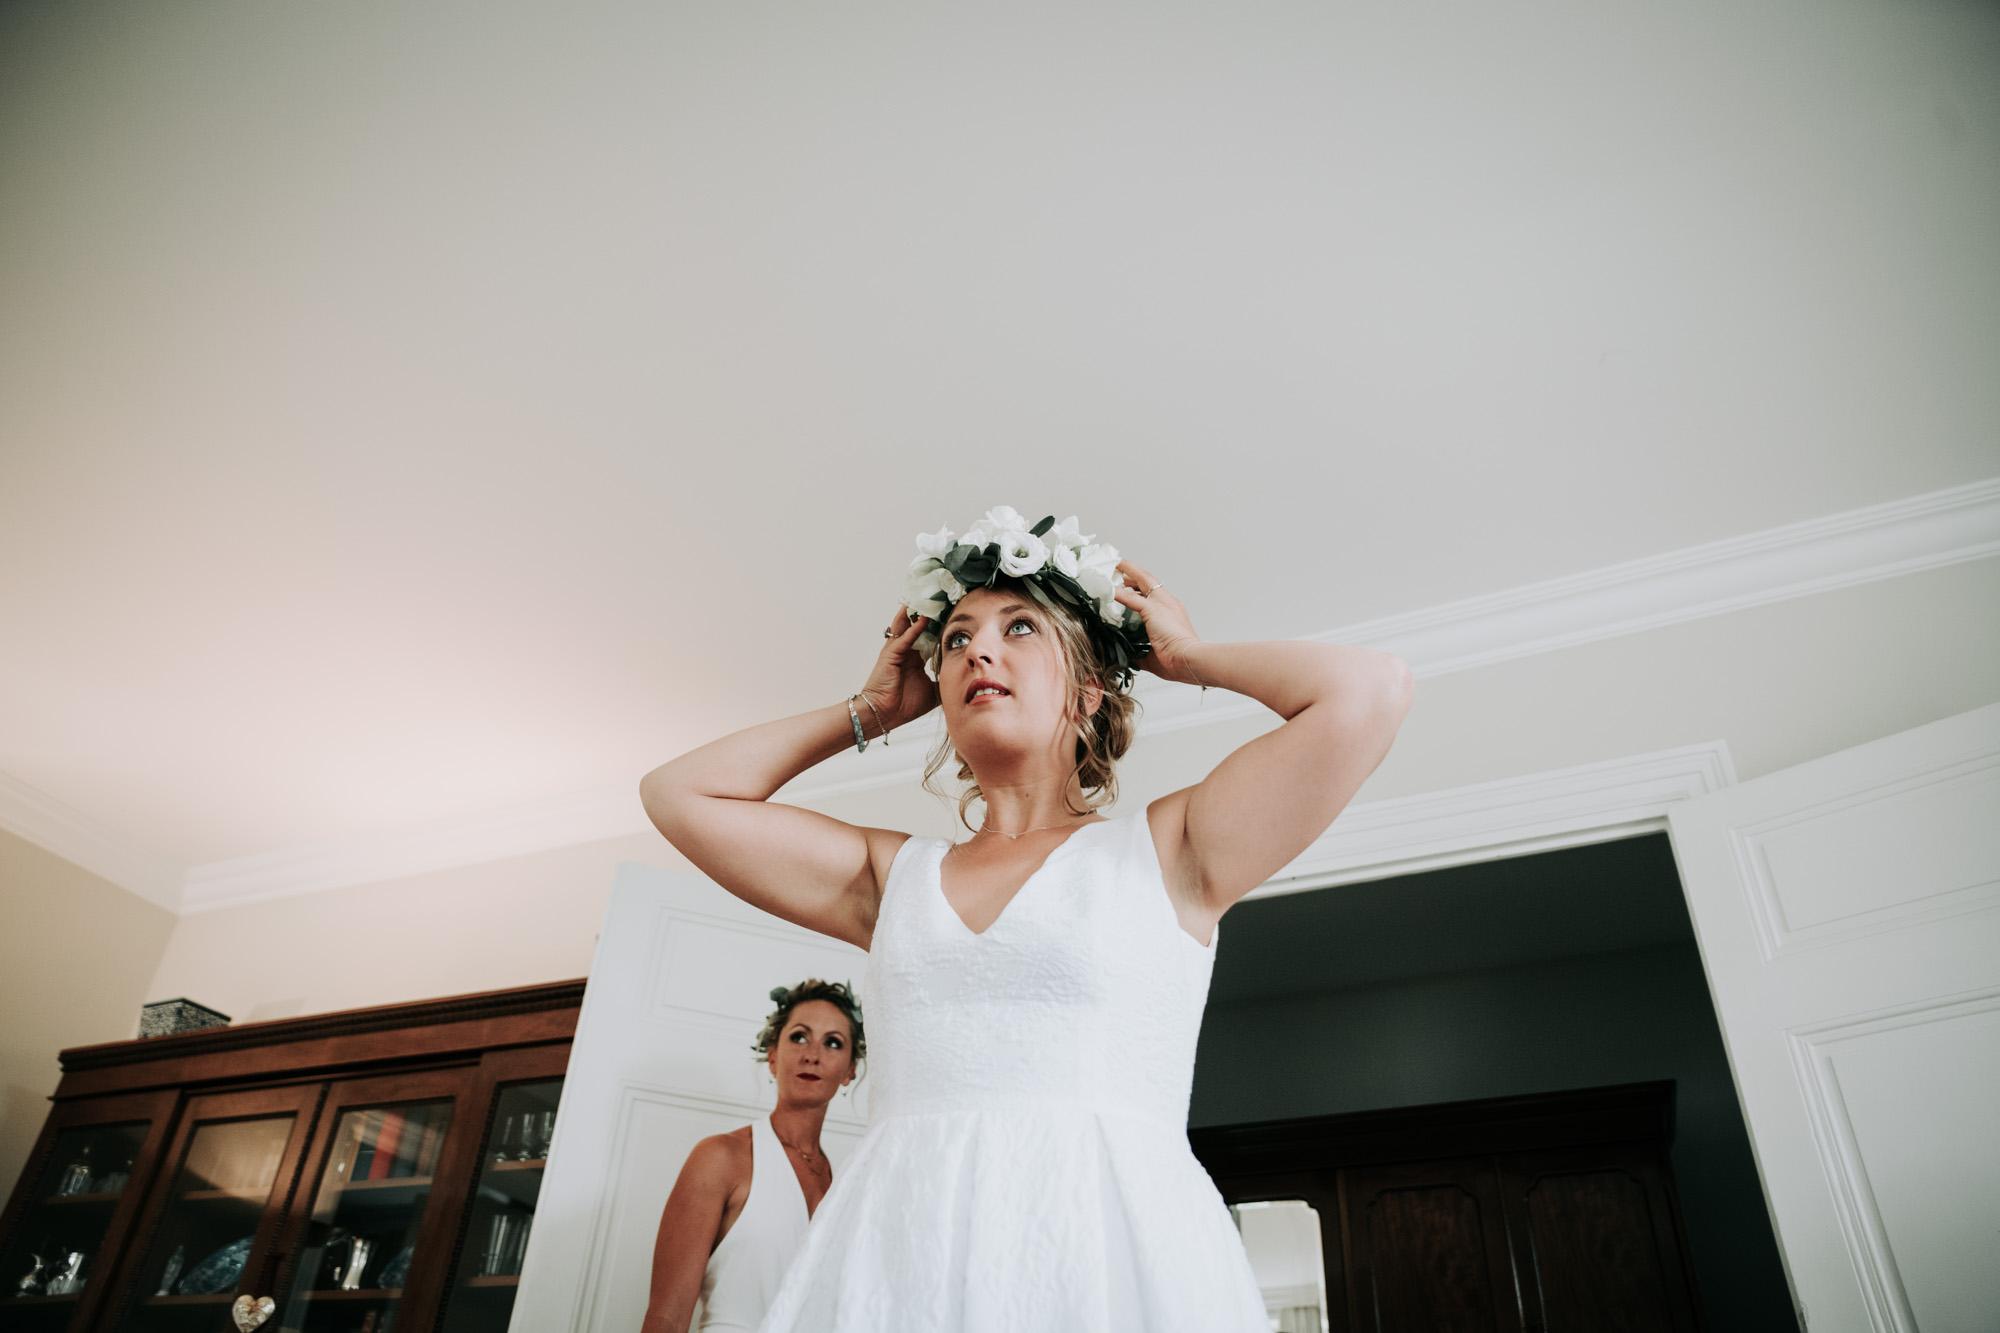 2018-07-21 - LD8_9668 - photographe mariage lyon - laurie diaz - www.lauriediazweeding.com.jpg